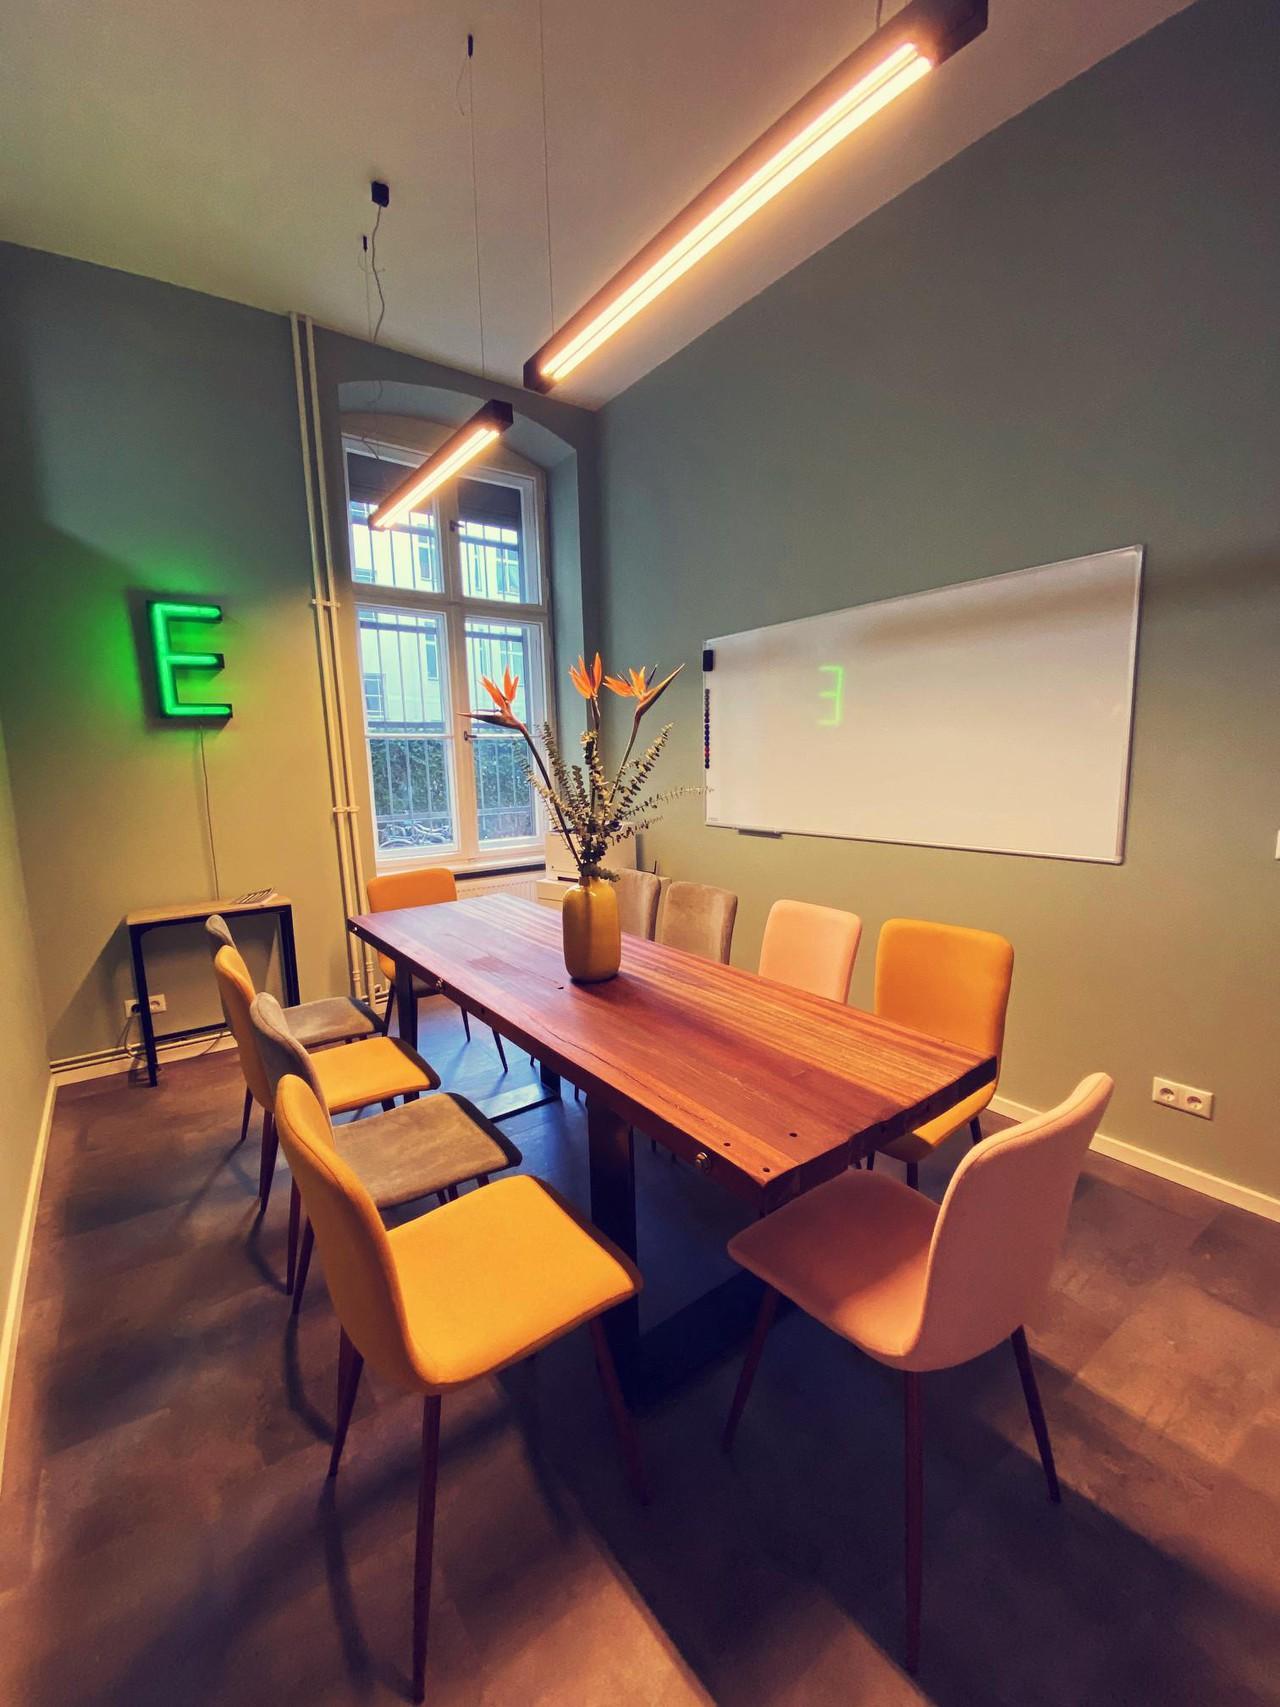 Berlin Schulungsräume Meeting room  image 7